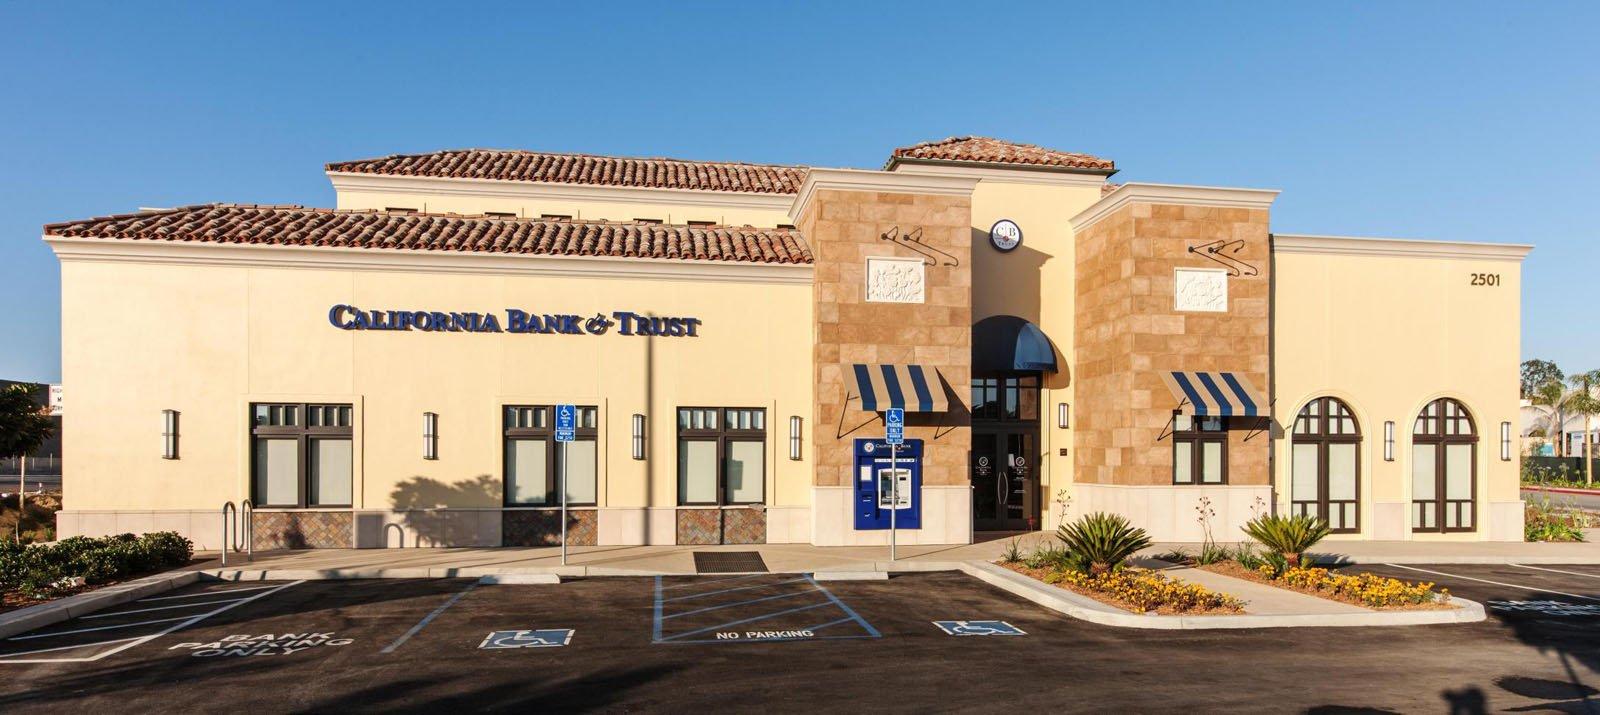 California Bank & Trust Palomar Commons